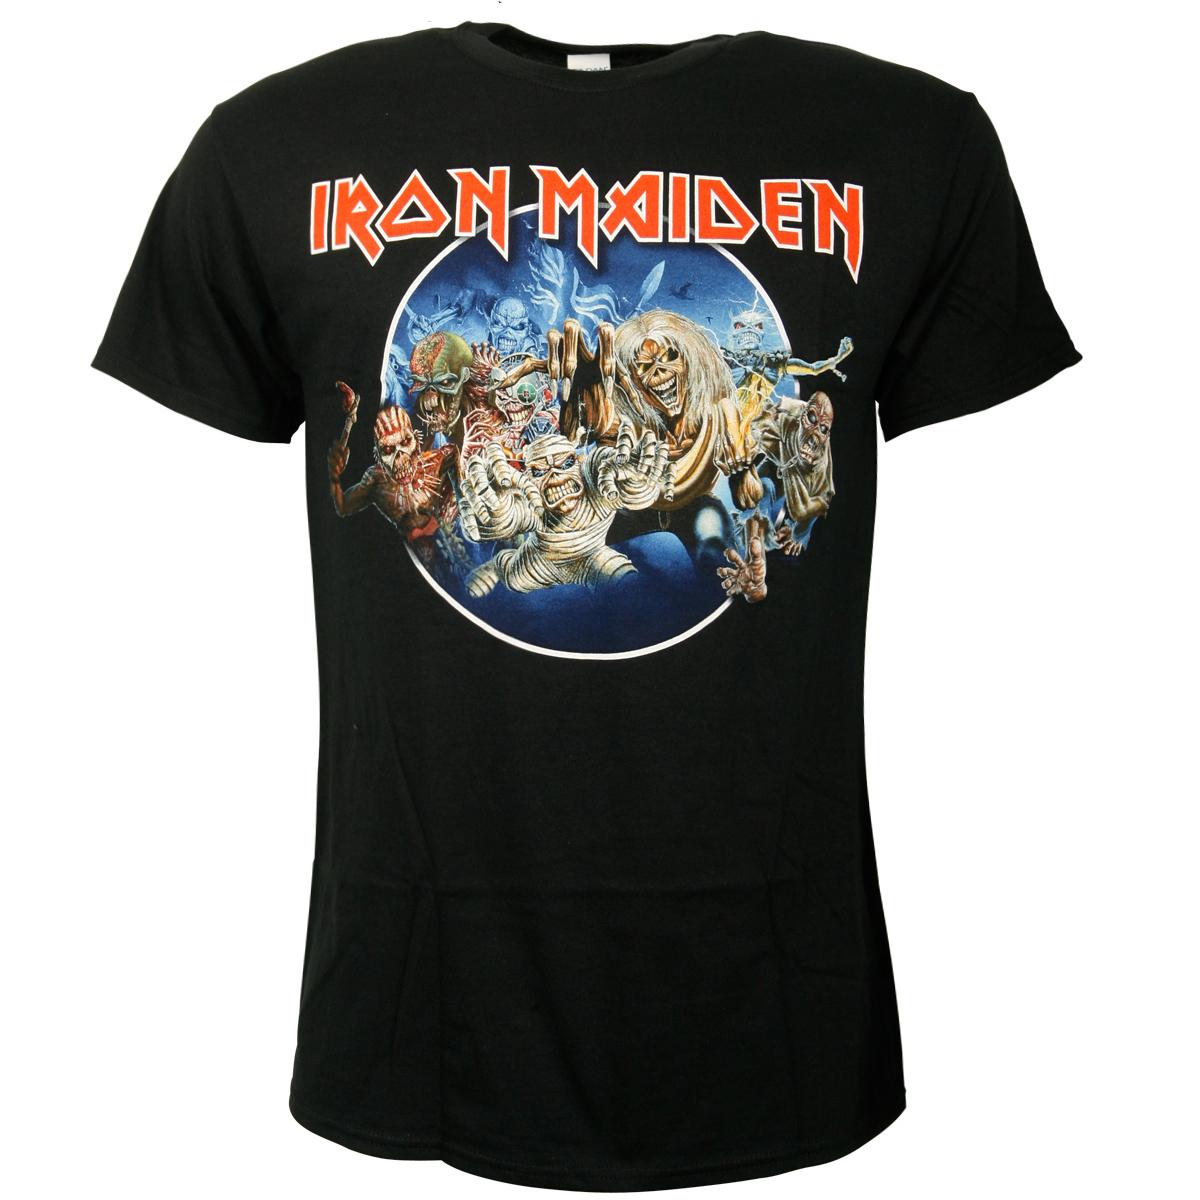 Iron Maiden - T-Shirt Wasted Years Circle - schwarz